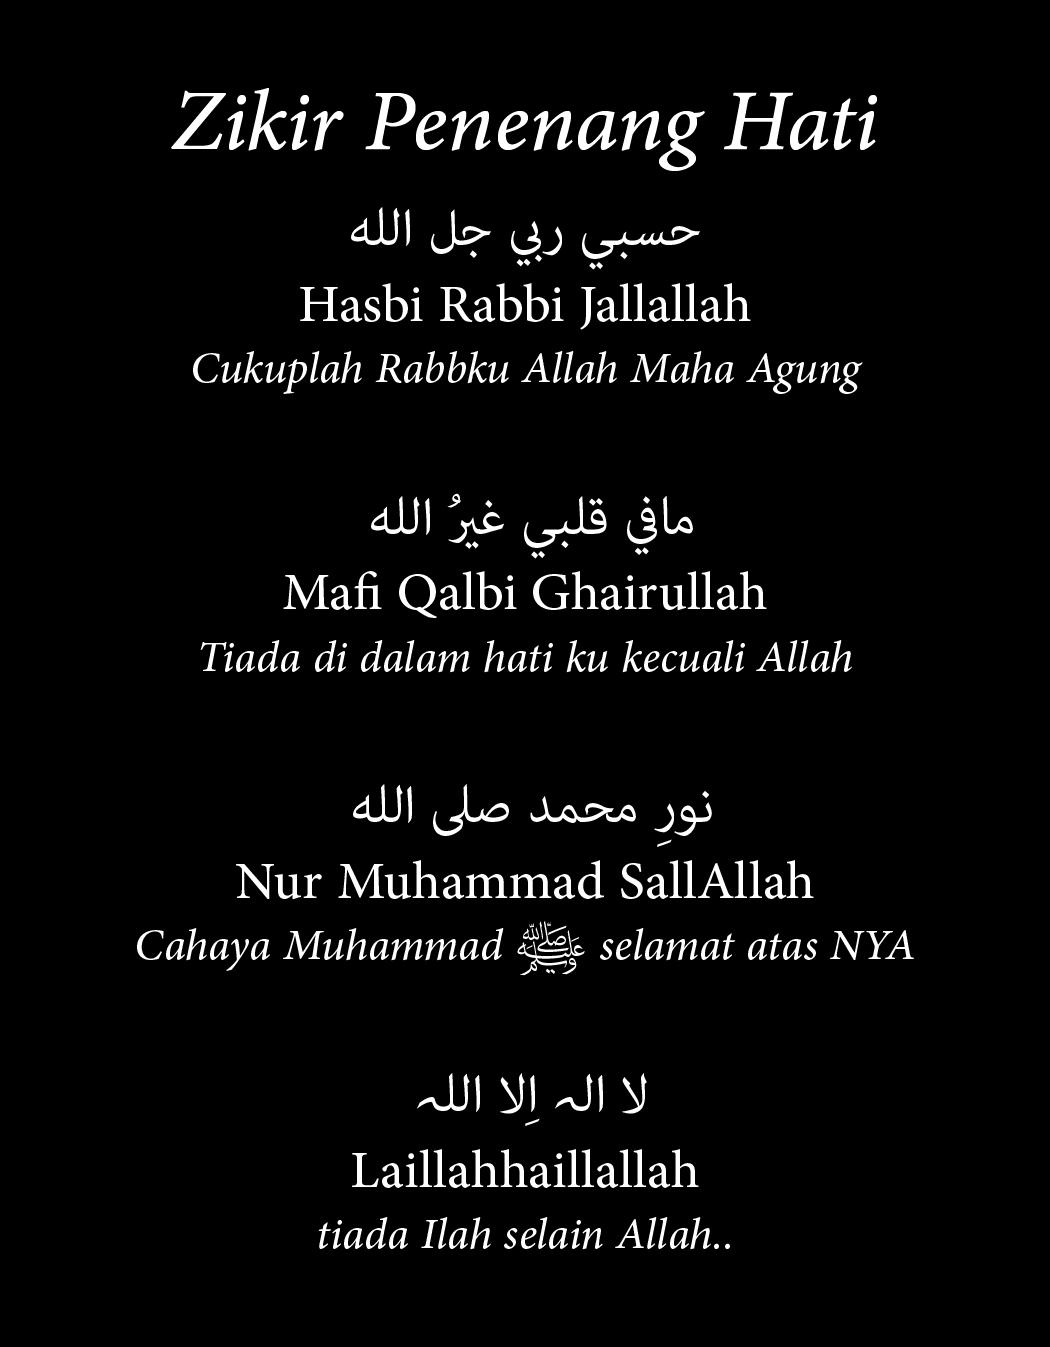 Ma Fi Qalbi Ghairullah : qalbi, ghairullah, Zikir, Hasbi, Rabbi, Jallallah, Givelasopa